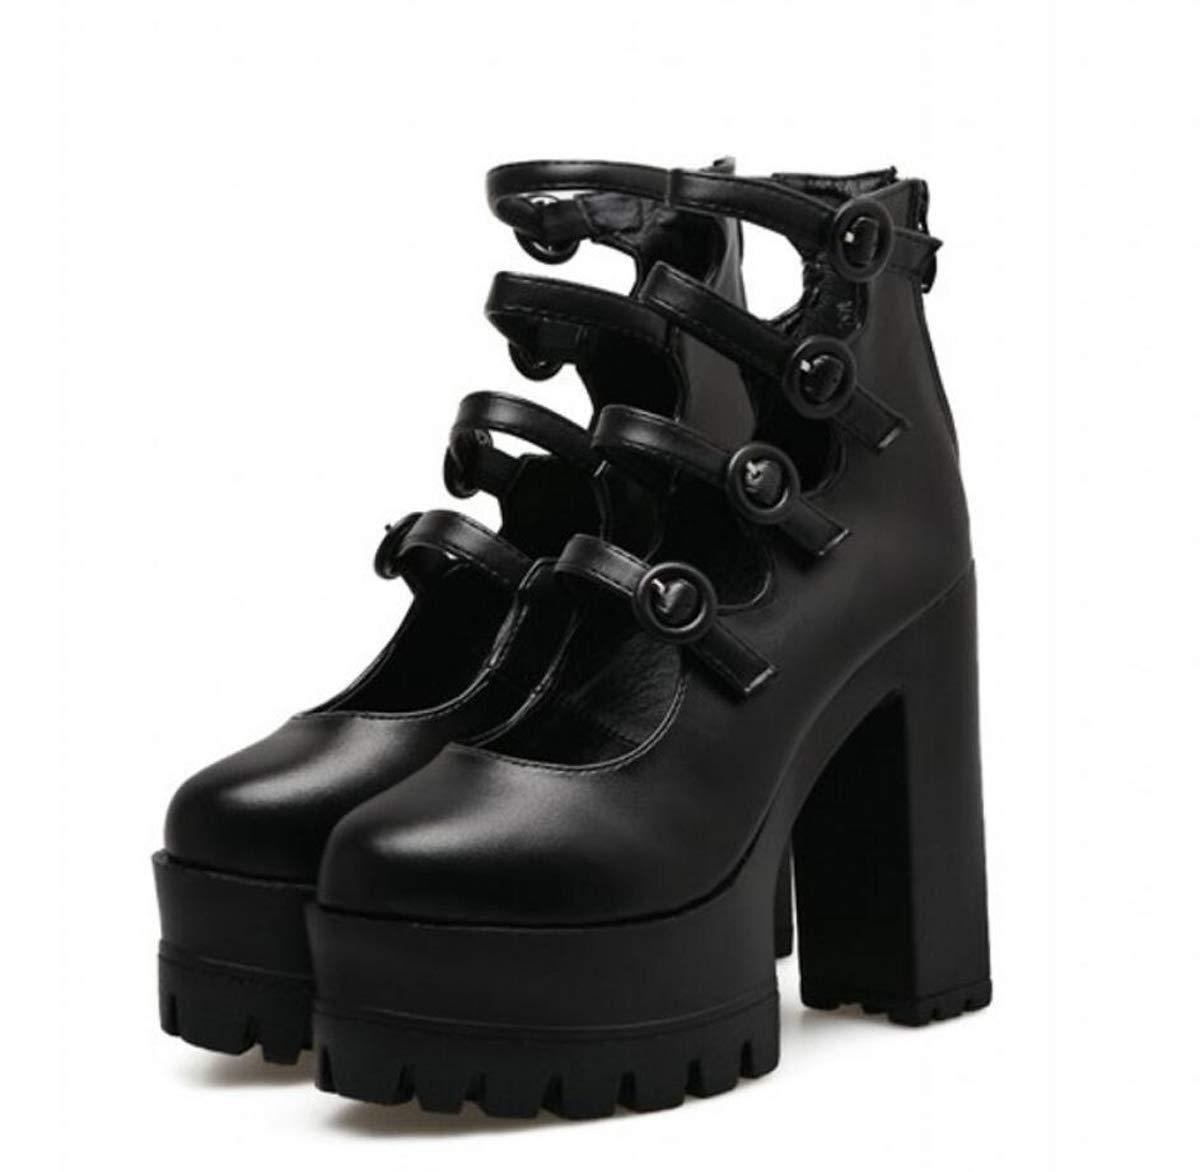 DANDANJIE Frauen Schuhe Super Plateau High Heel Plateau Super Stiefel Block Chunky Heels Buckle Schuhe für 2019 Frühling schwarz 37EU 86d255